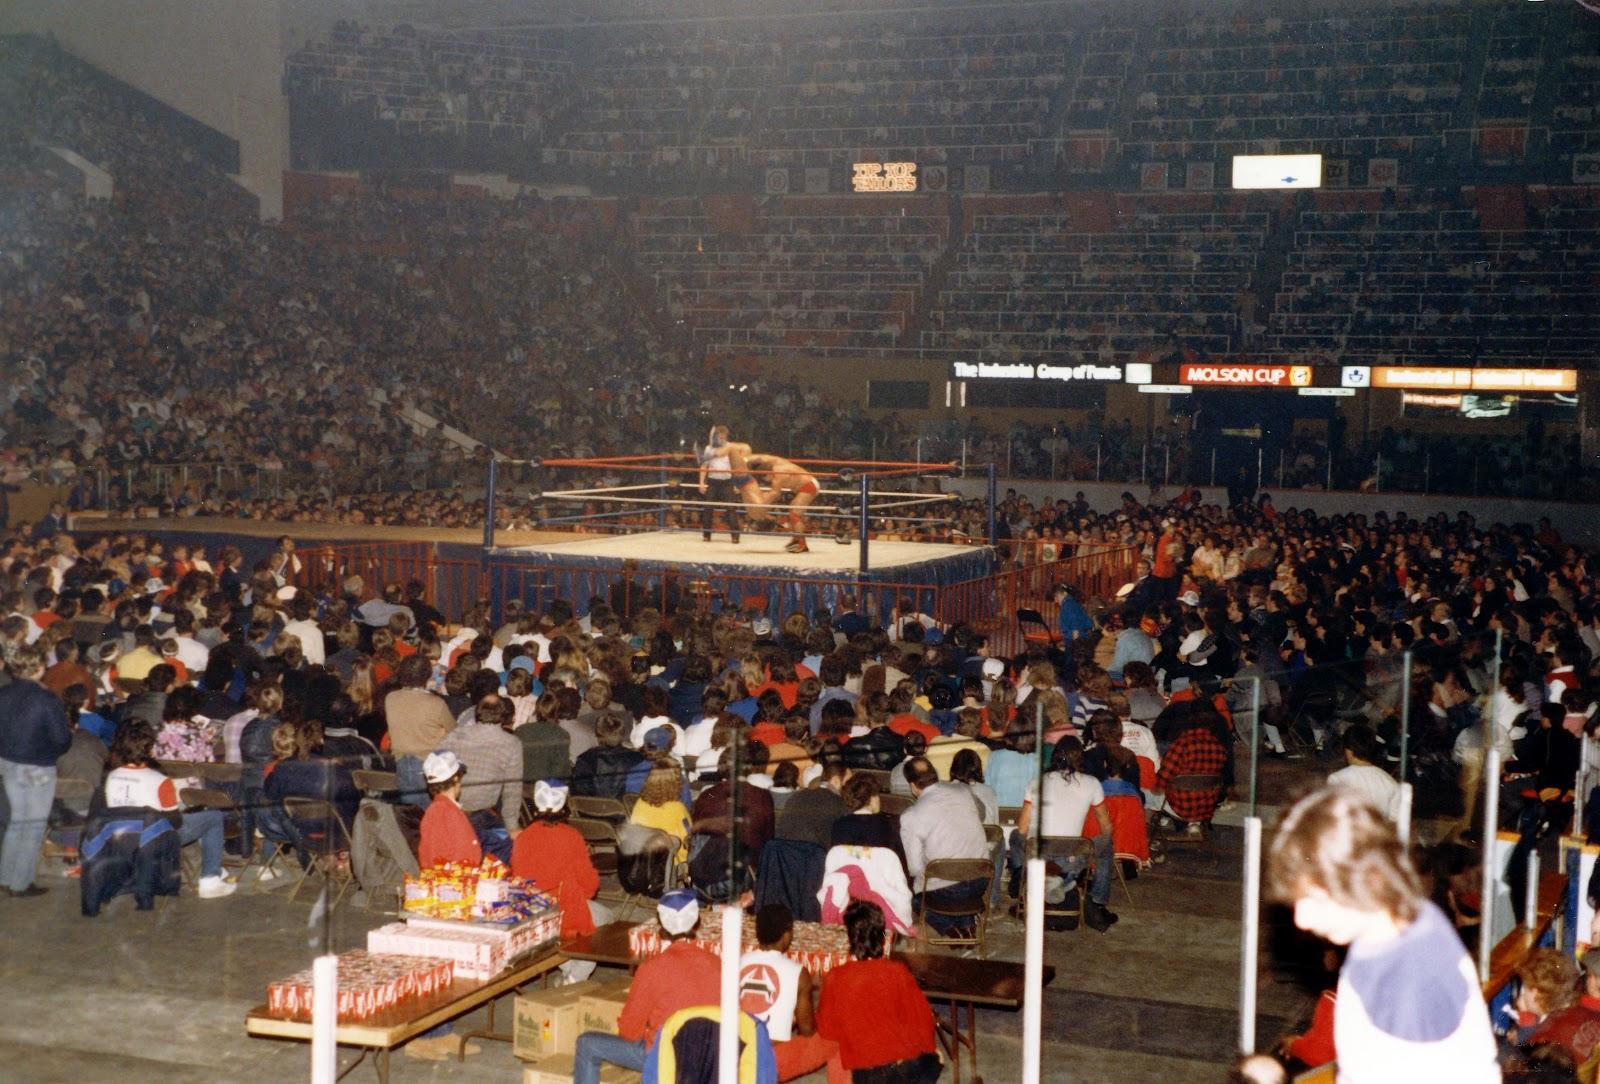 1986-12-28+-+wwf+wrestling-mlg-sds+02-di